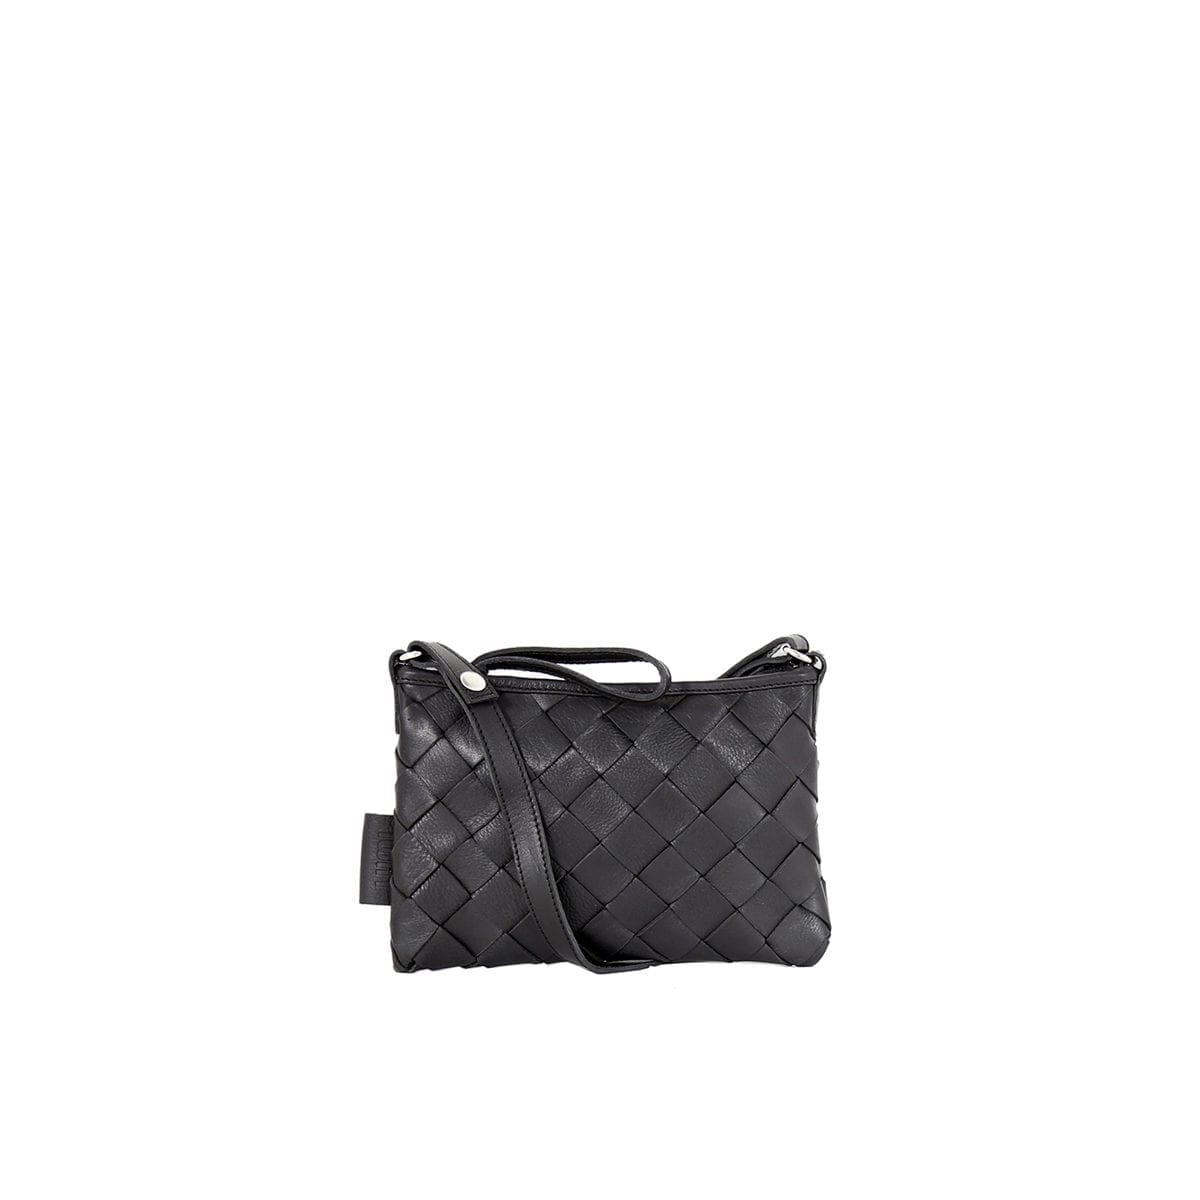 d750a03b7c760b Toarie Woven Clutch Small Black – Lumi Accessories